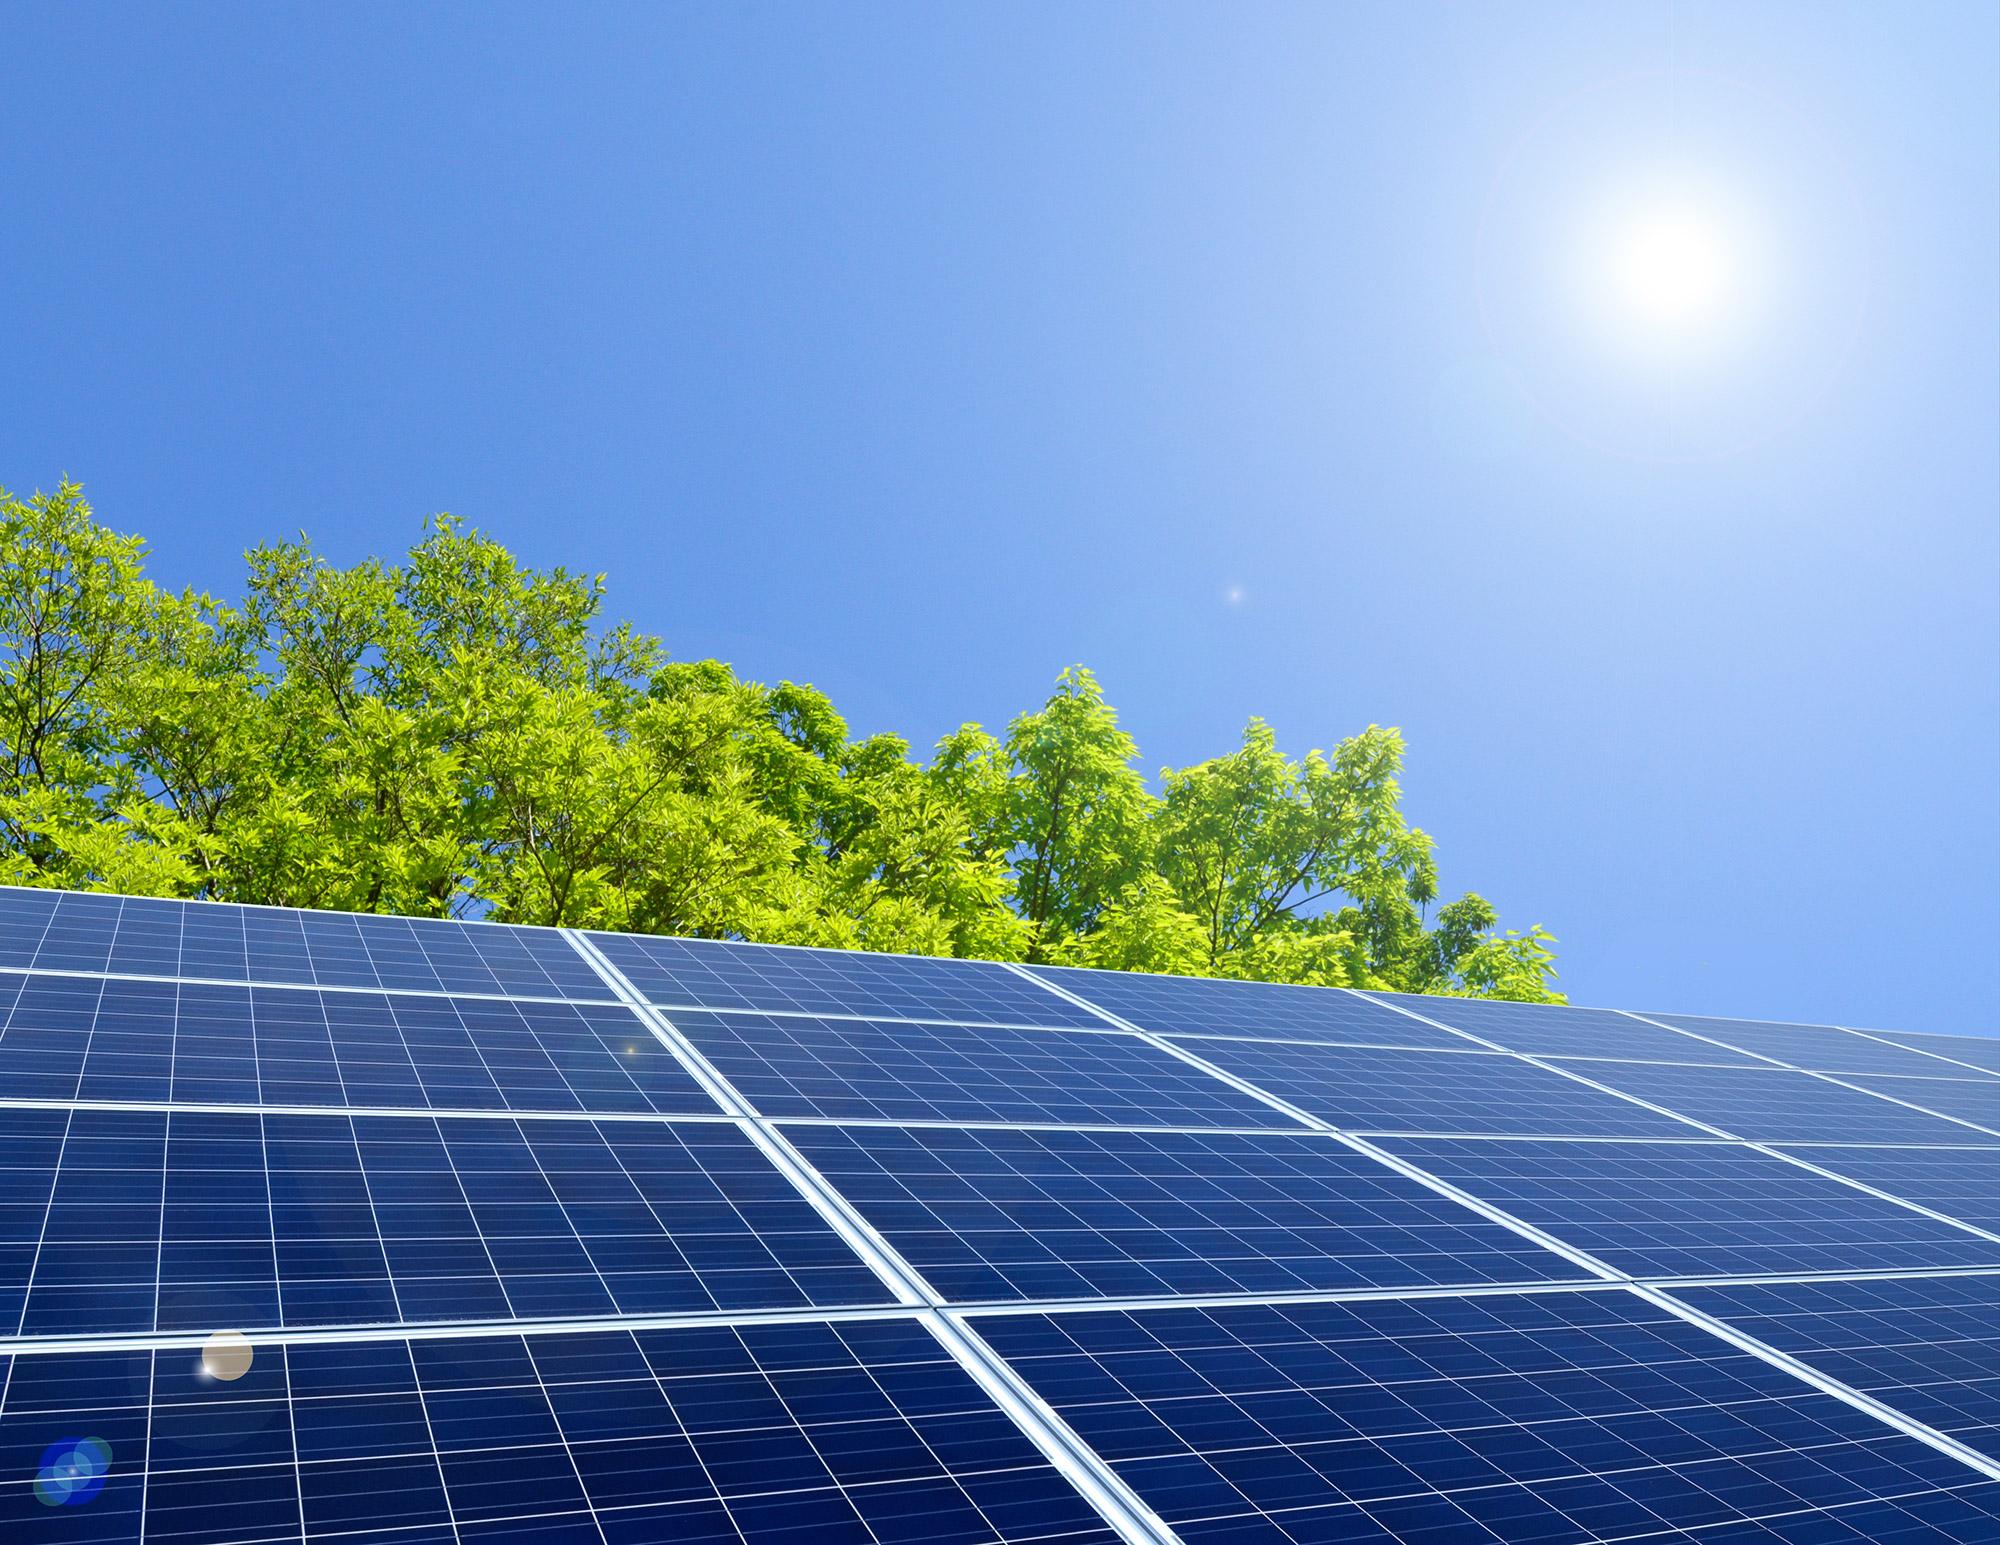 Impianti fotovoltaici - soetech.it